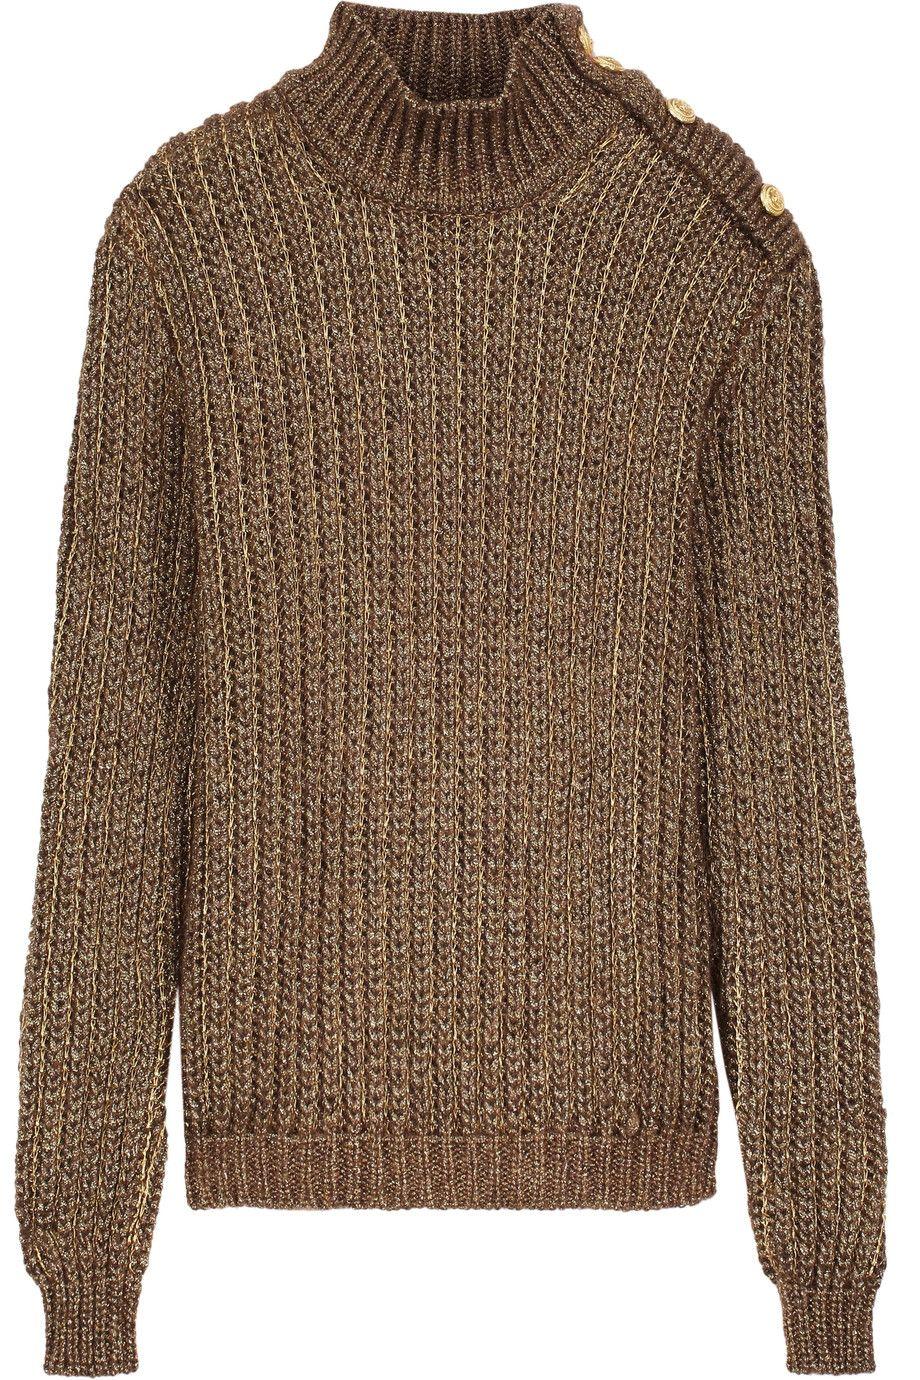 BALMAIN Metallic Open-Knit Mohair Blend Turtleneck Sweater. #balmain #cloth #sweater